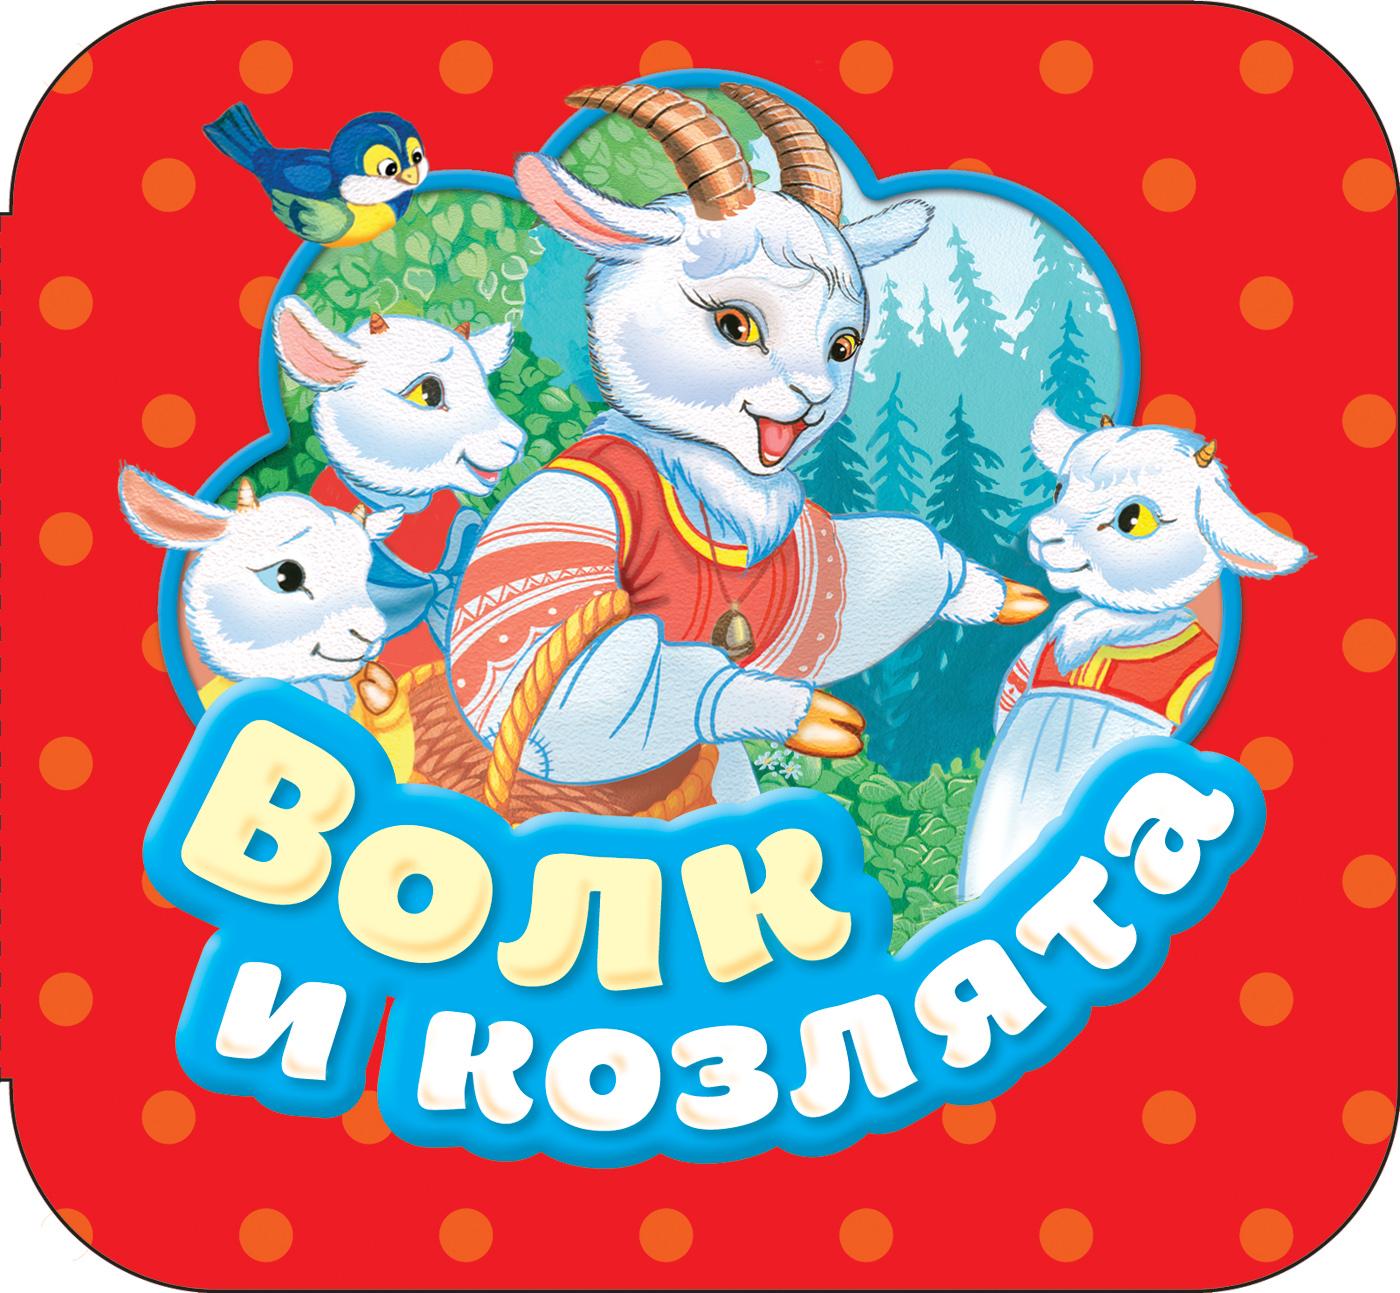 Афанасьев А. Н. Волк и козлята (Гармошки)